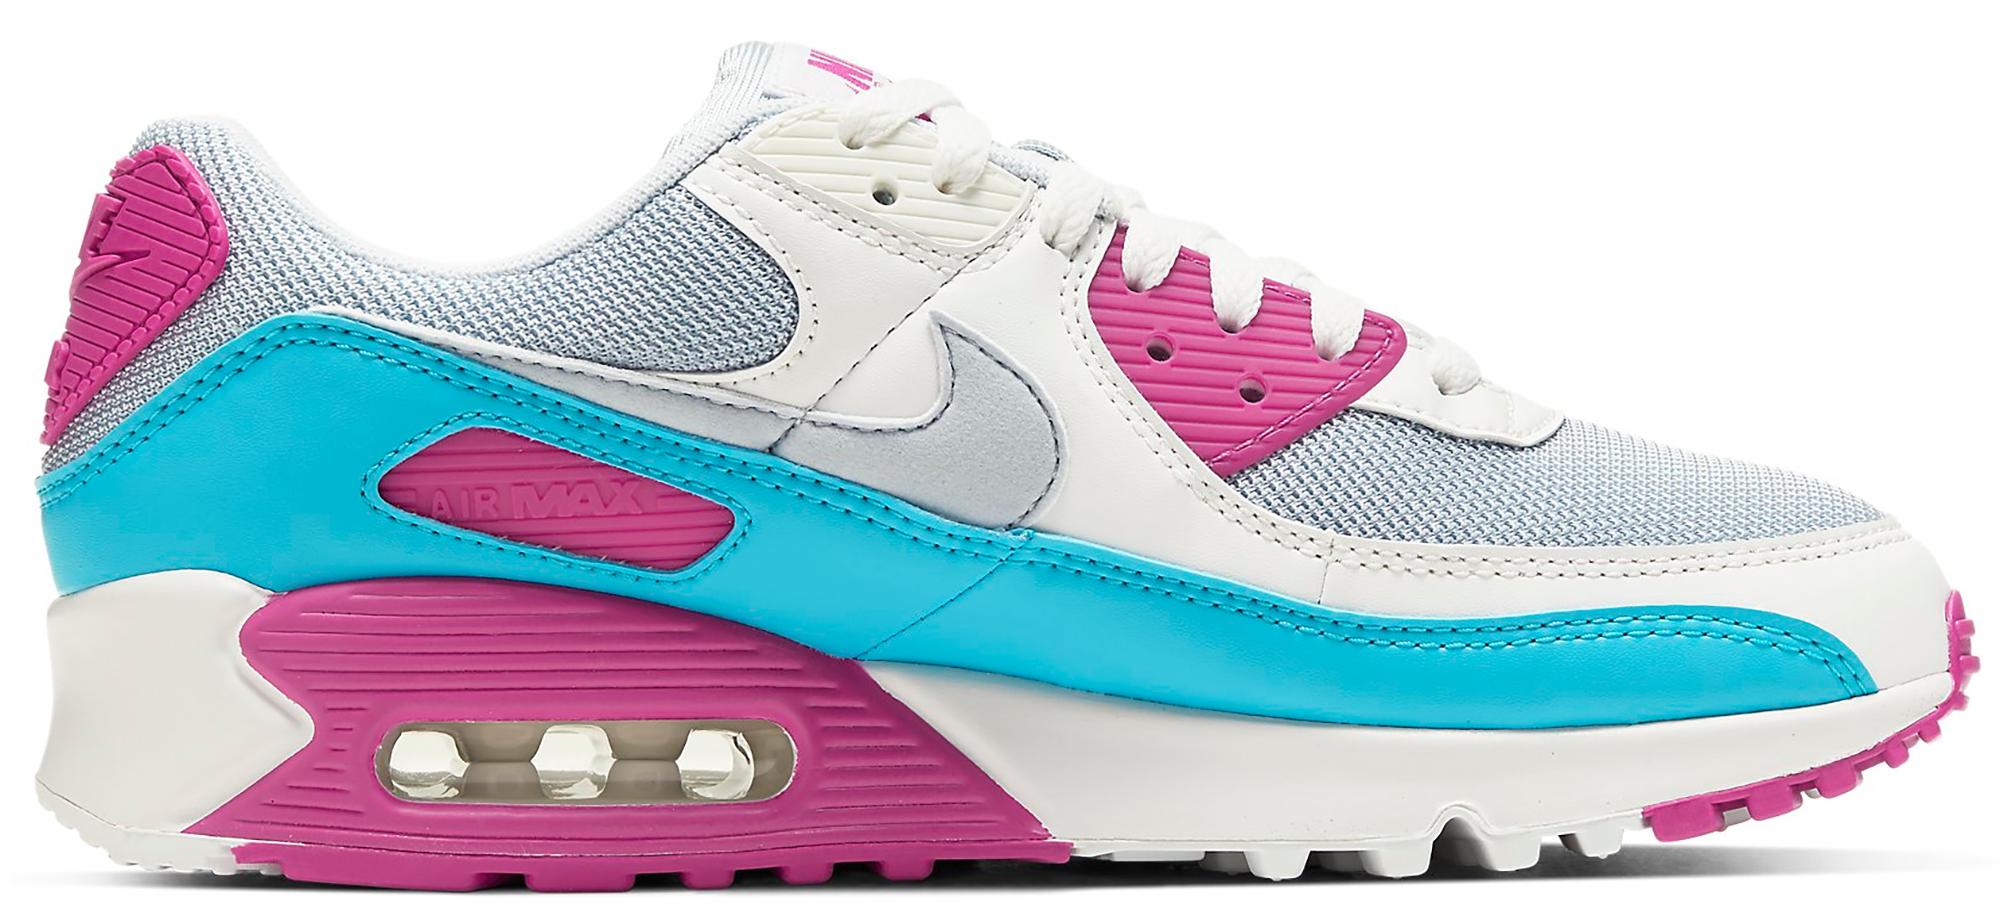 Nike Air Max 90 White Vivid Pink Light